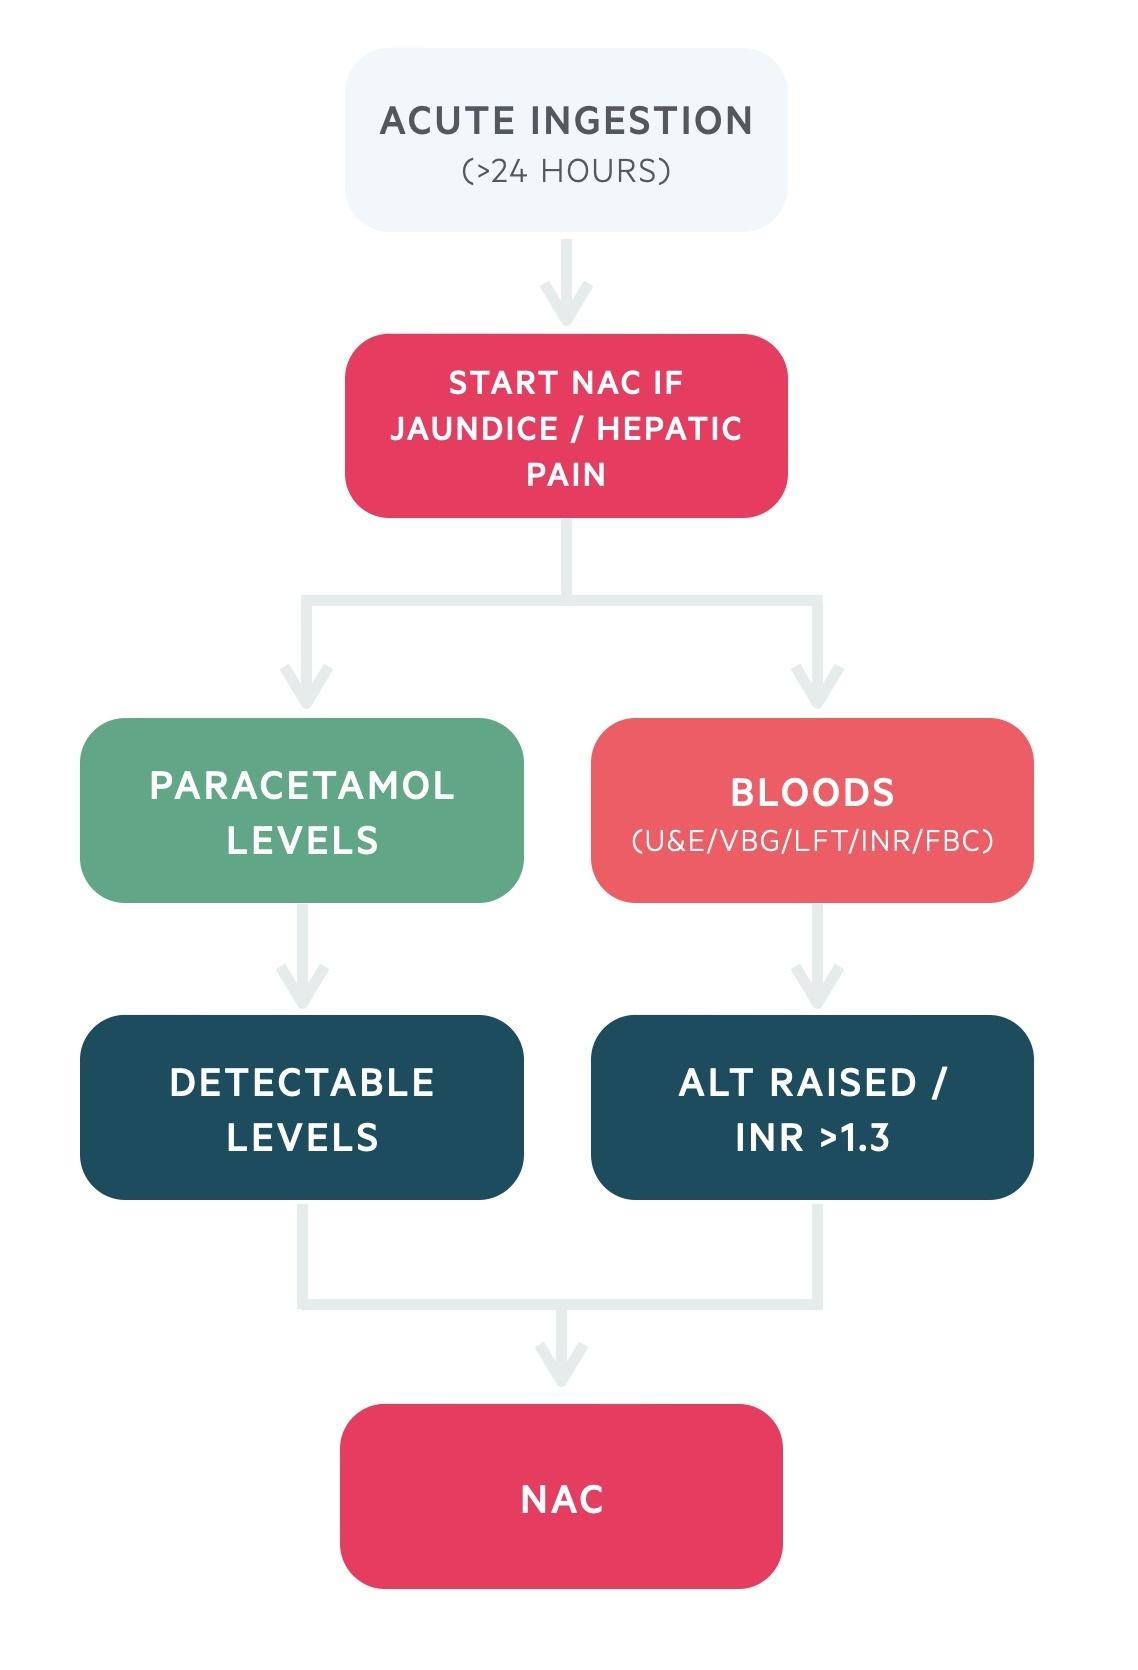 Acute ingestion (>24 hours) paracetamol overdose management